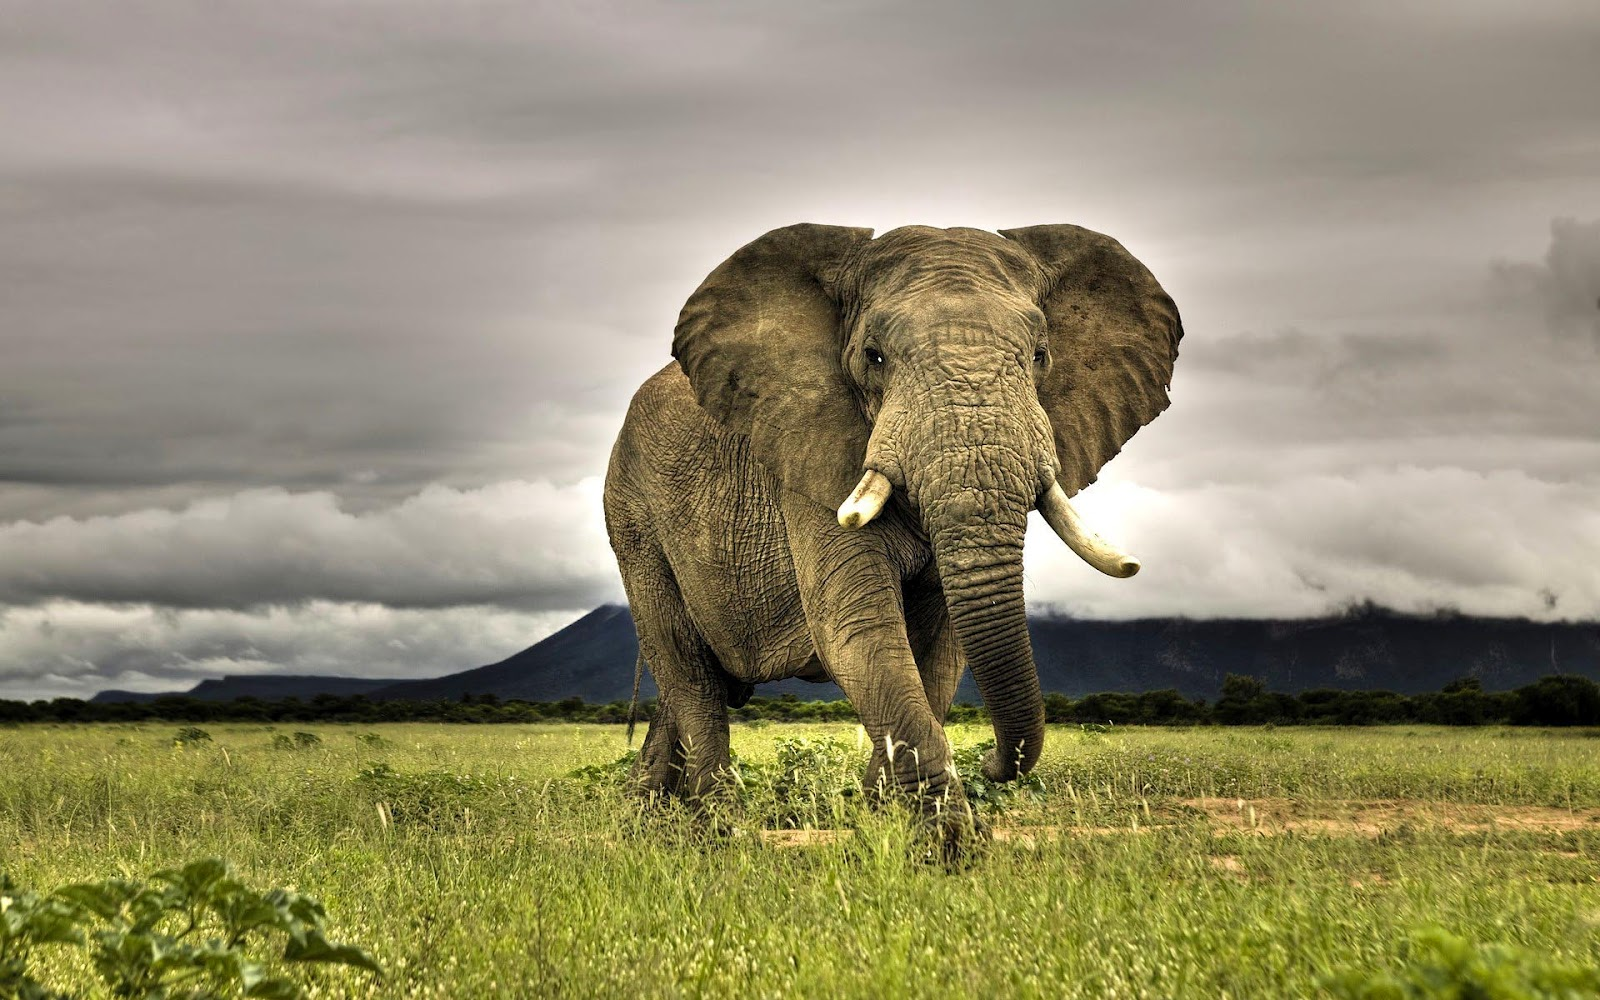 हाथी elephants in hindi